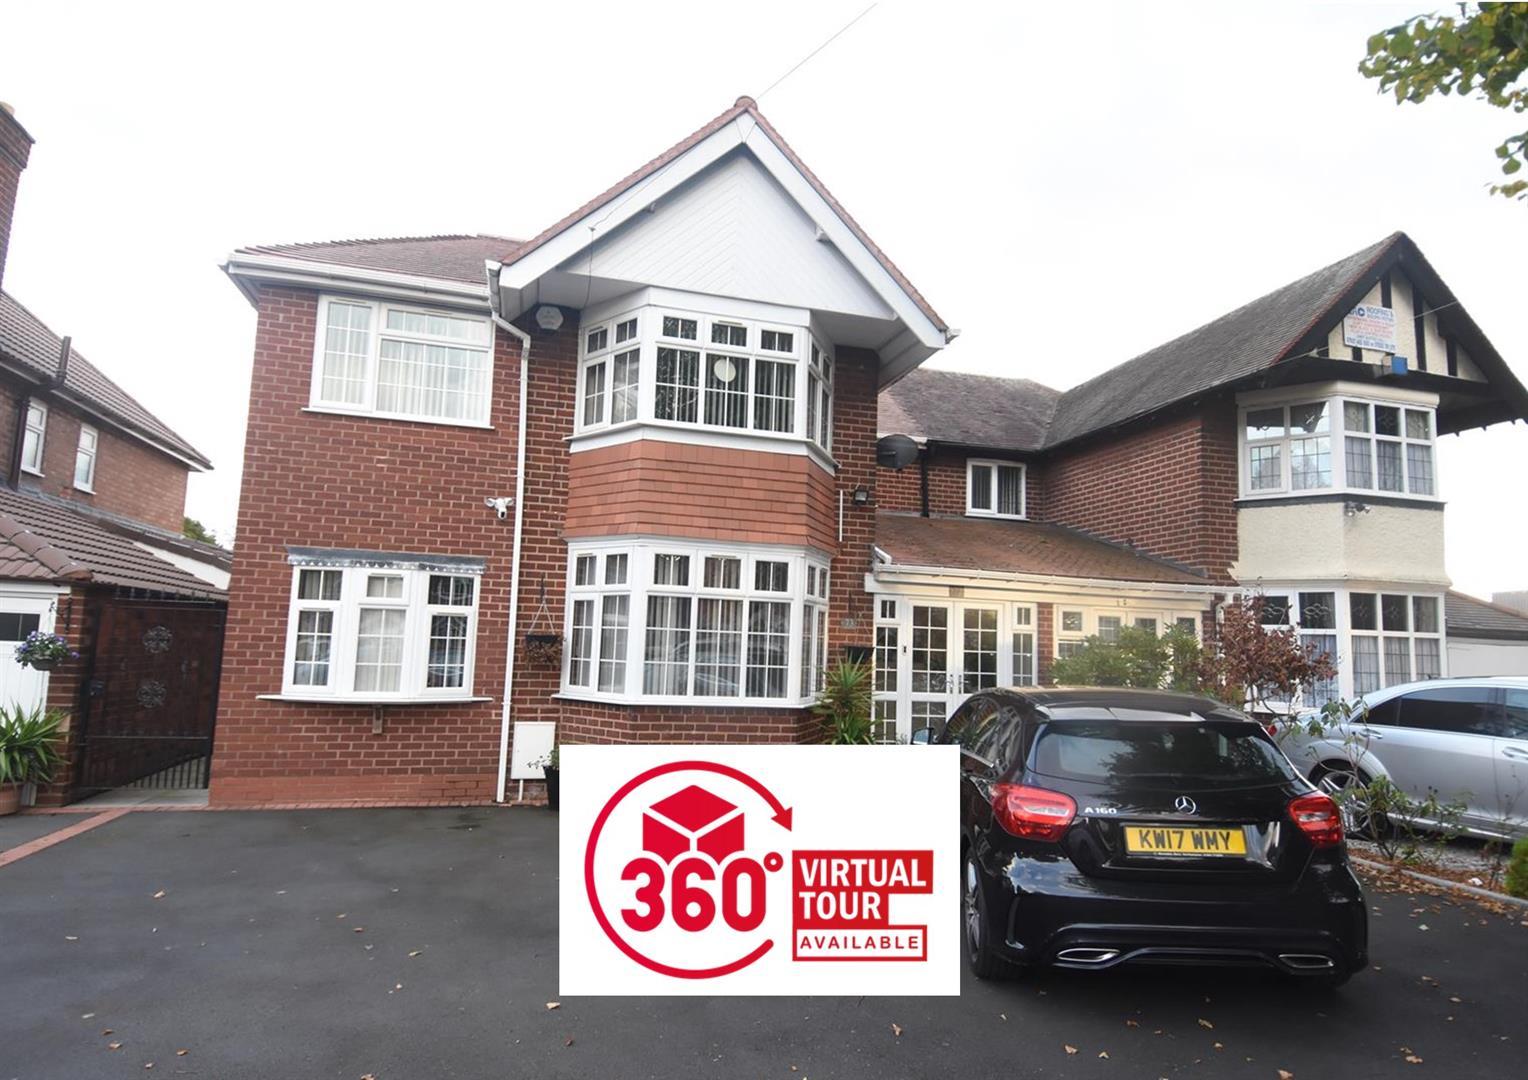 4 bed house for sale in Brockhurst Road, Birmingham, B36